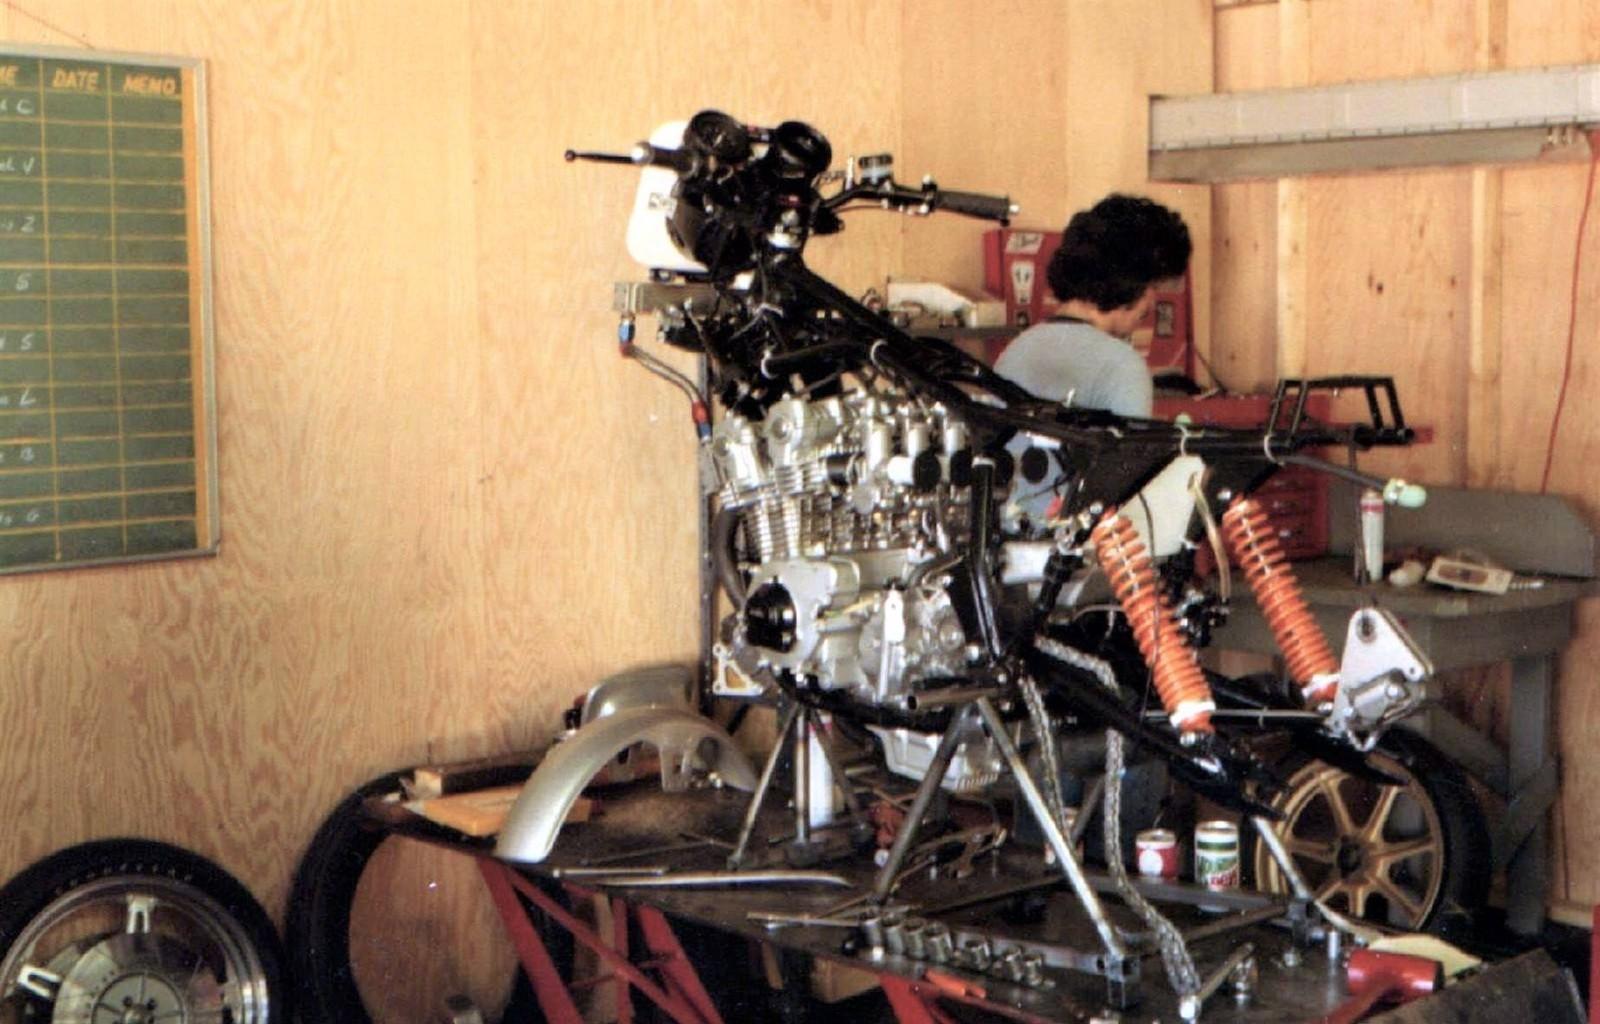 FD703B2F-A3A6-4F47-A920-C8C120E92CC9